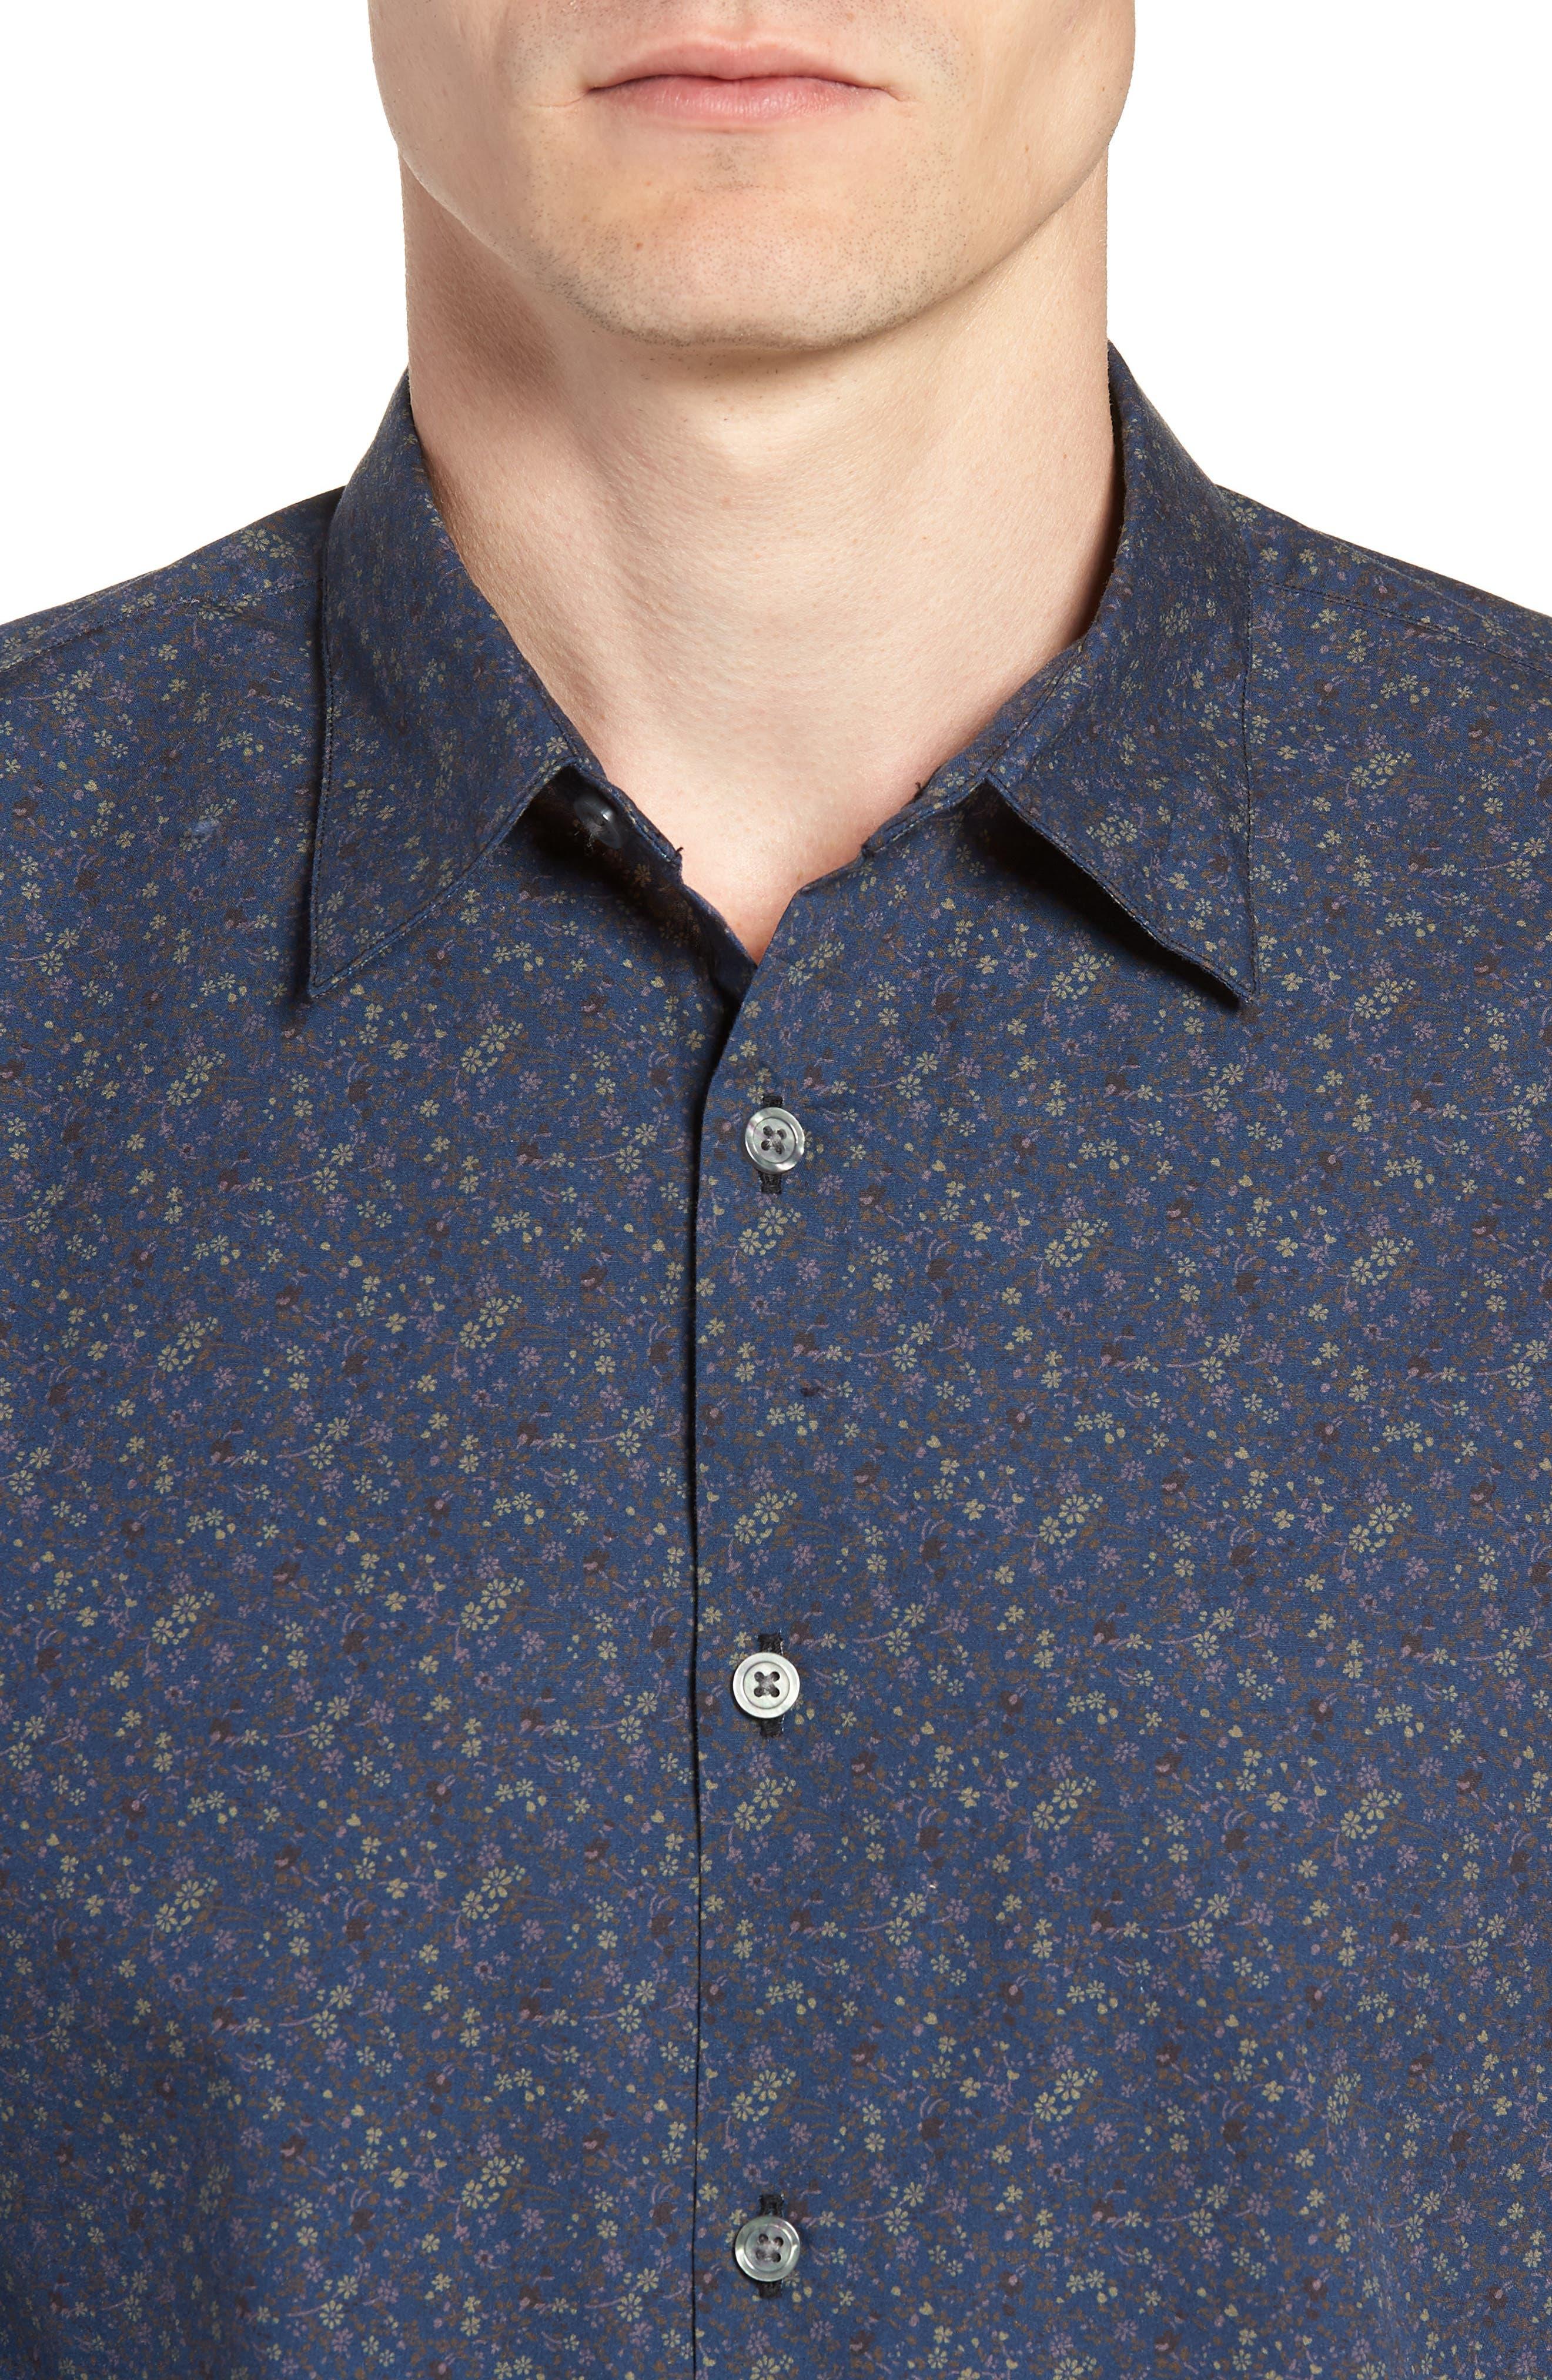 Regular Fit Sport Shirt,                             Alternate thumbnail 2, color,                             BLUE